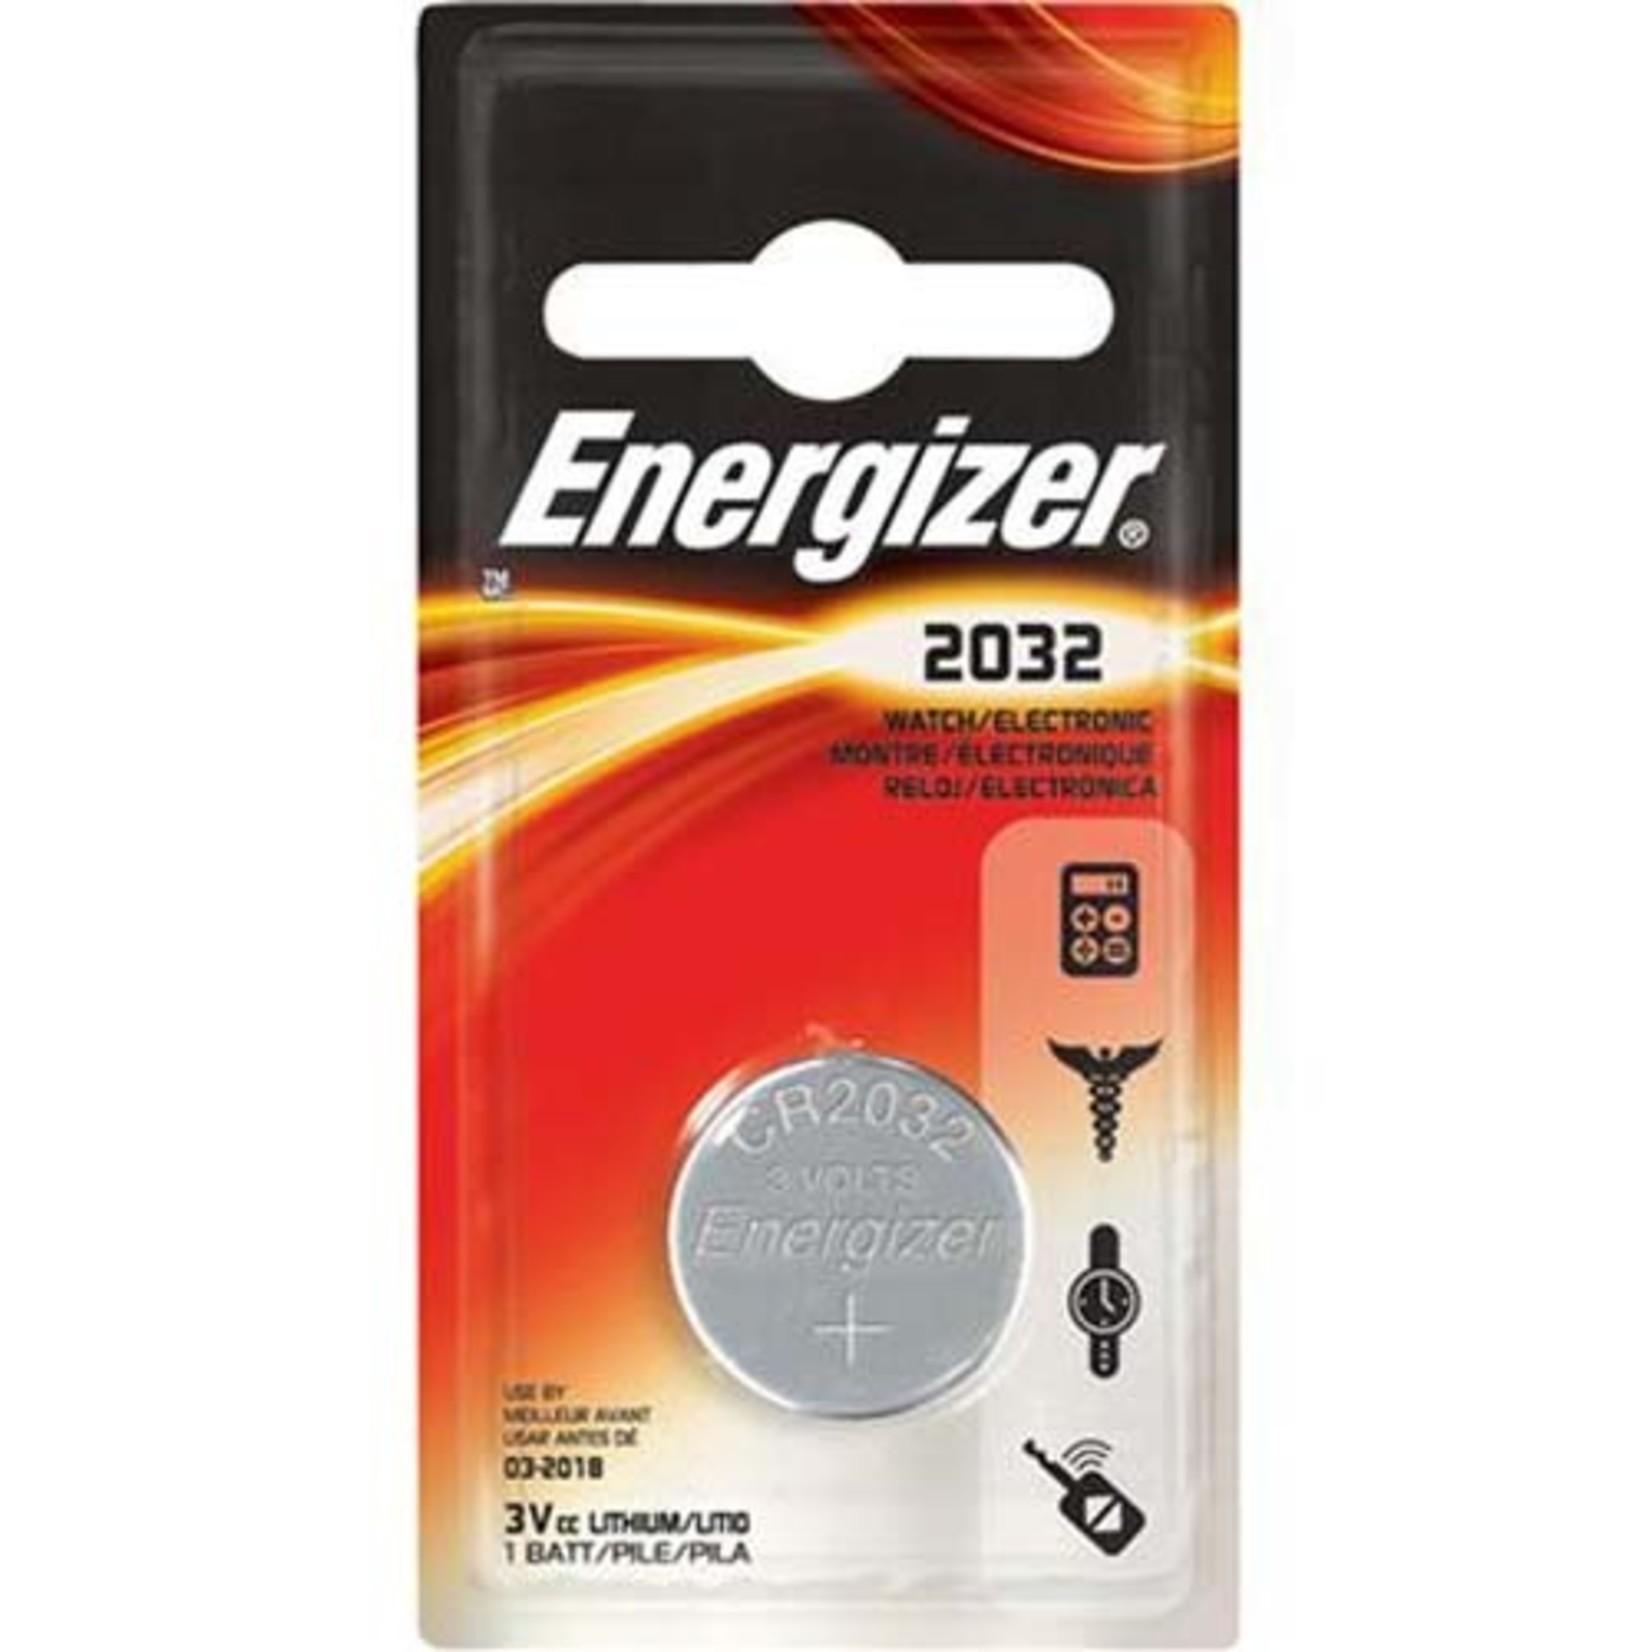 Energizer Energizer CR2032 3 volt lithium